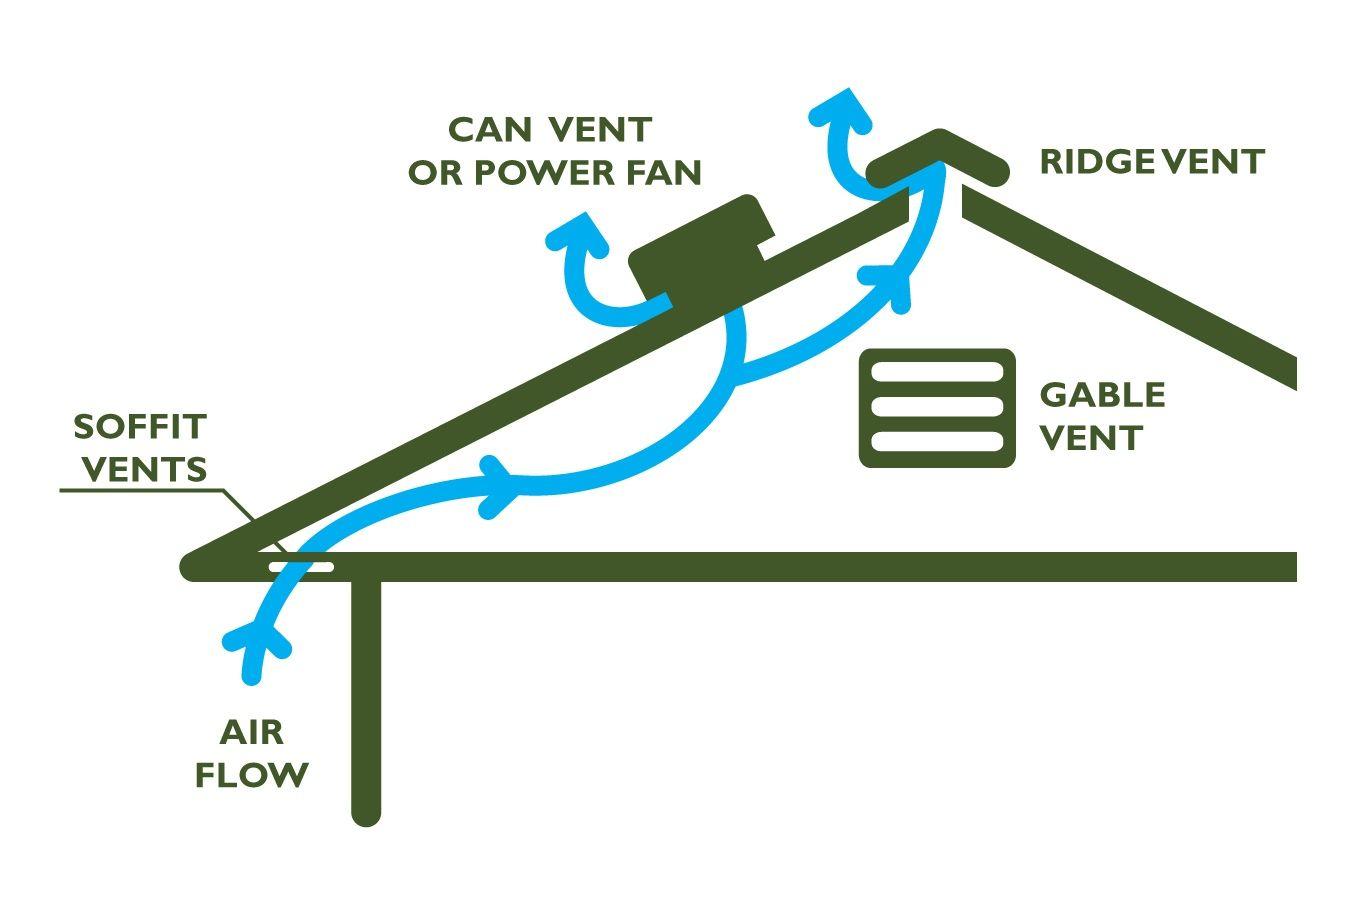 Energy Smart Home Performance Attic Ventilation Soffit Ridge Attic Ventilation Gable Vents Ventilation